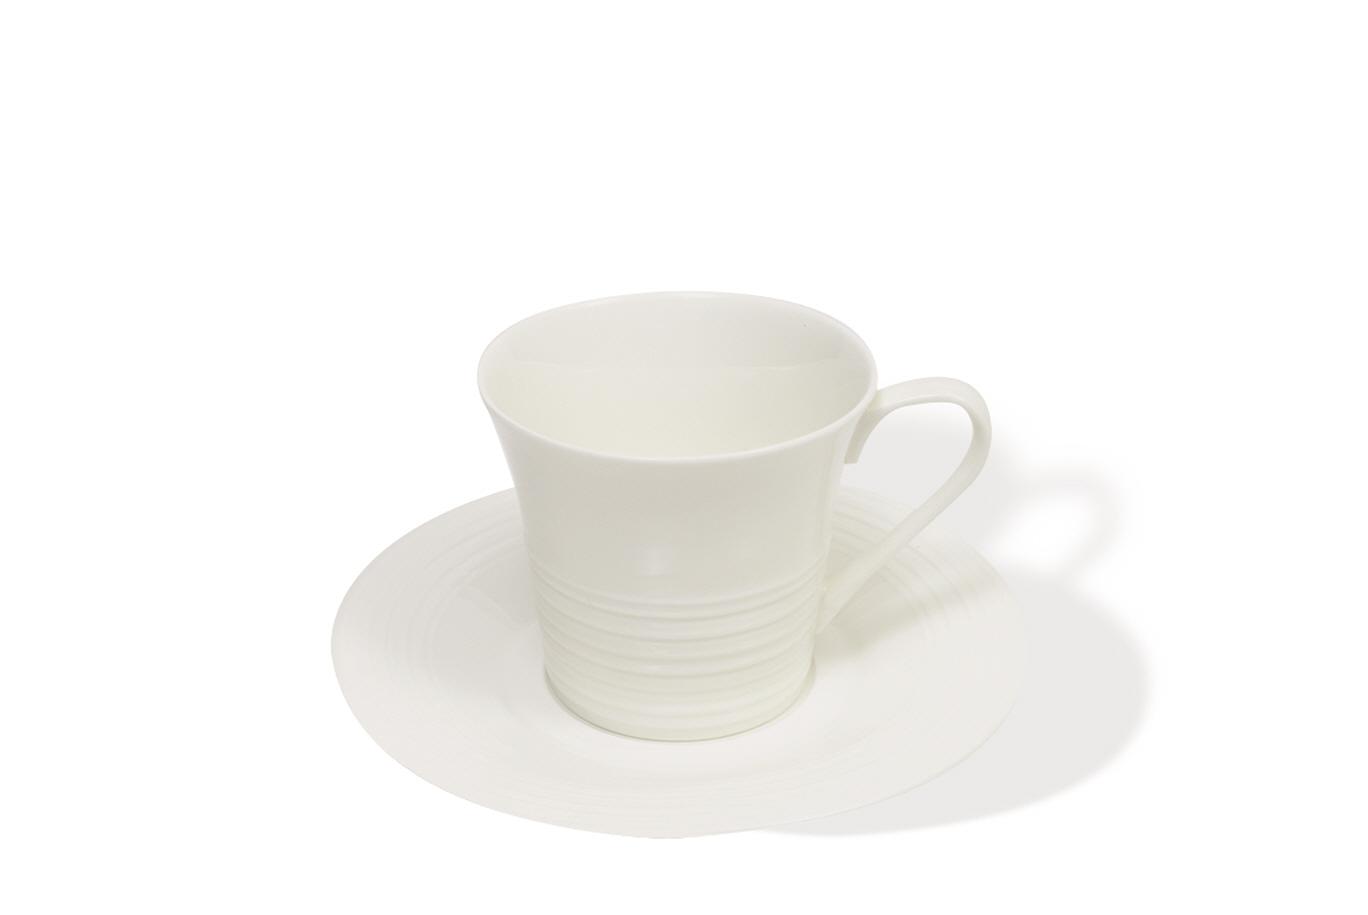 Šálek s podšálkem na cappuccino White Basics Cirque 220 ml - Maxwell&Williams